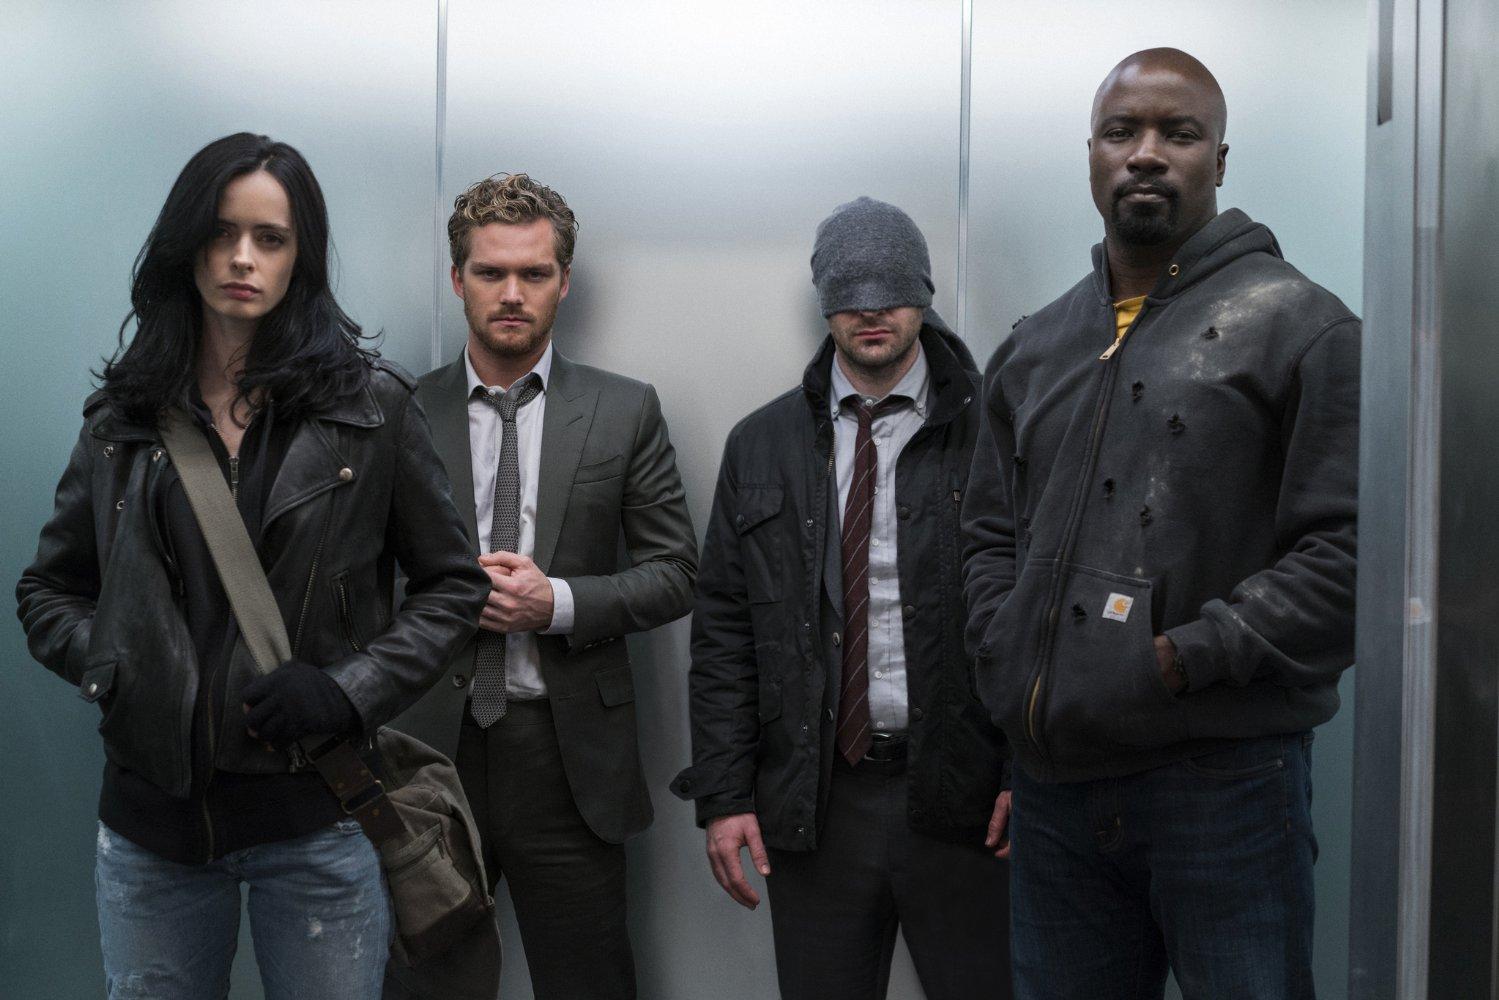 Charlie Cox, Krysten Ritter, Mike Colter y Finn Jones en un imagen promocional de la serie The Defenders de Netflix